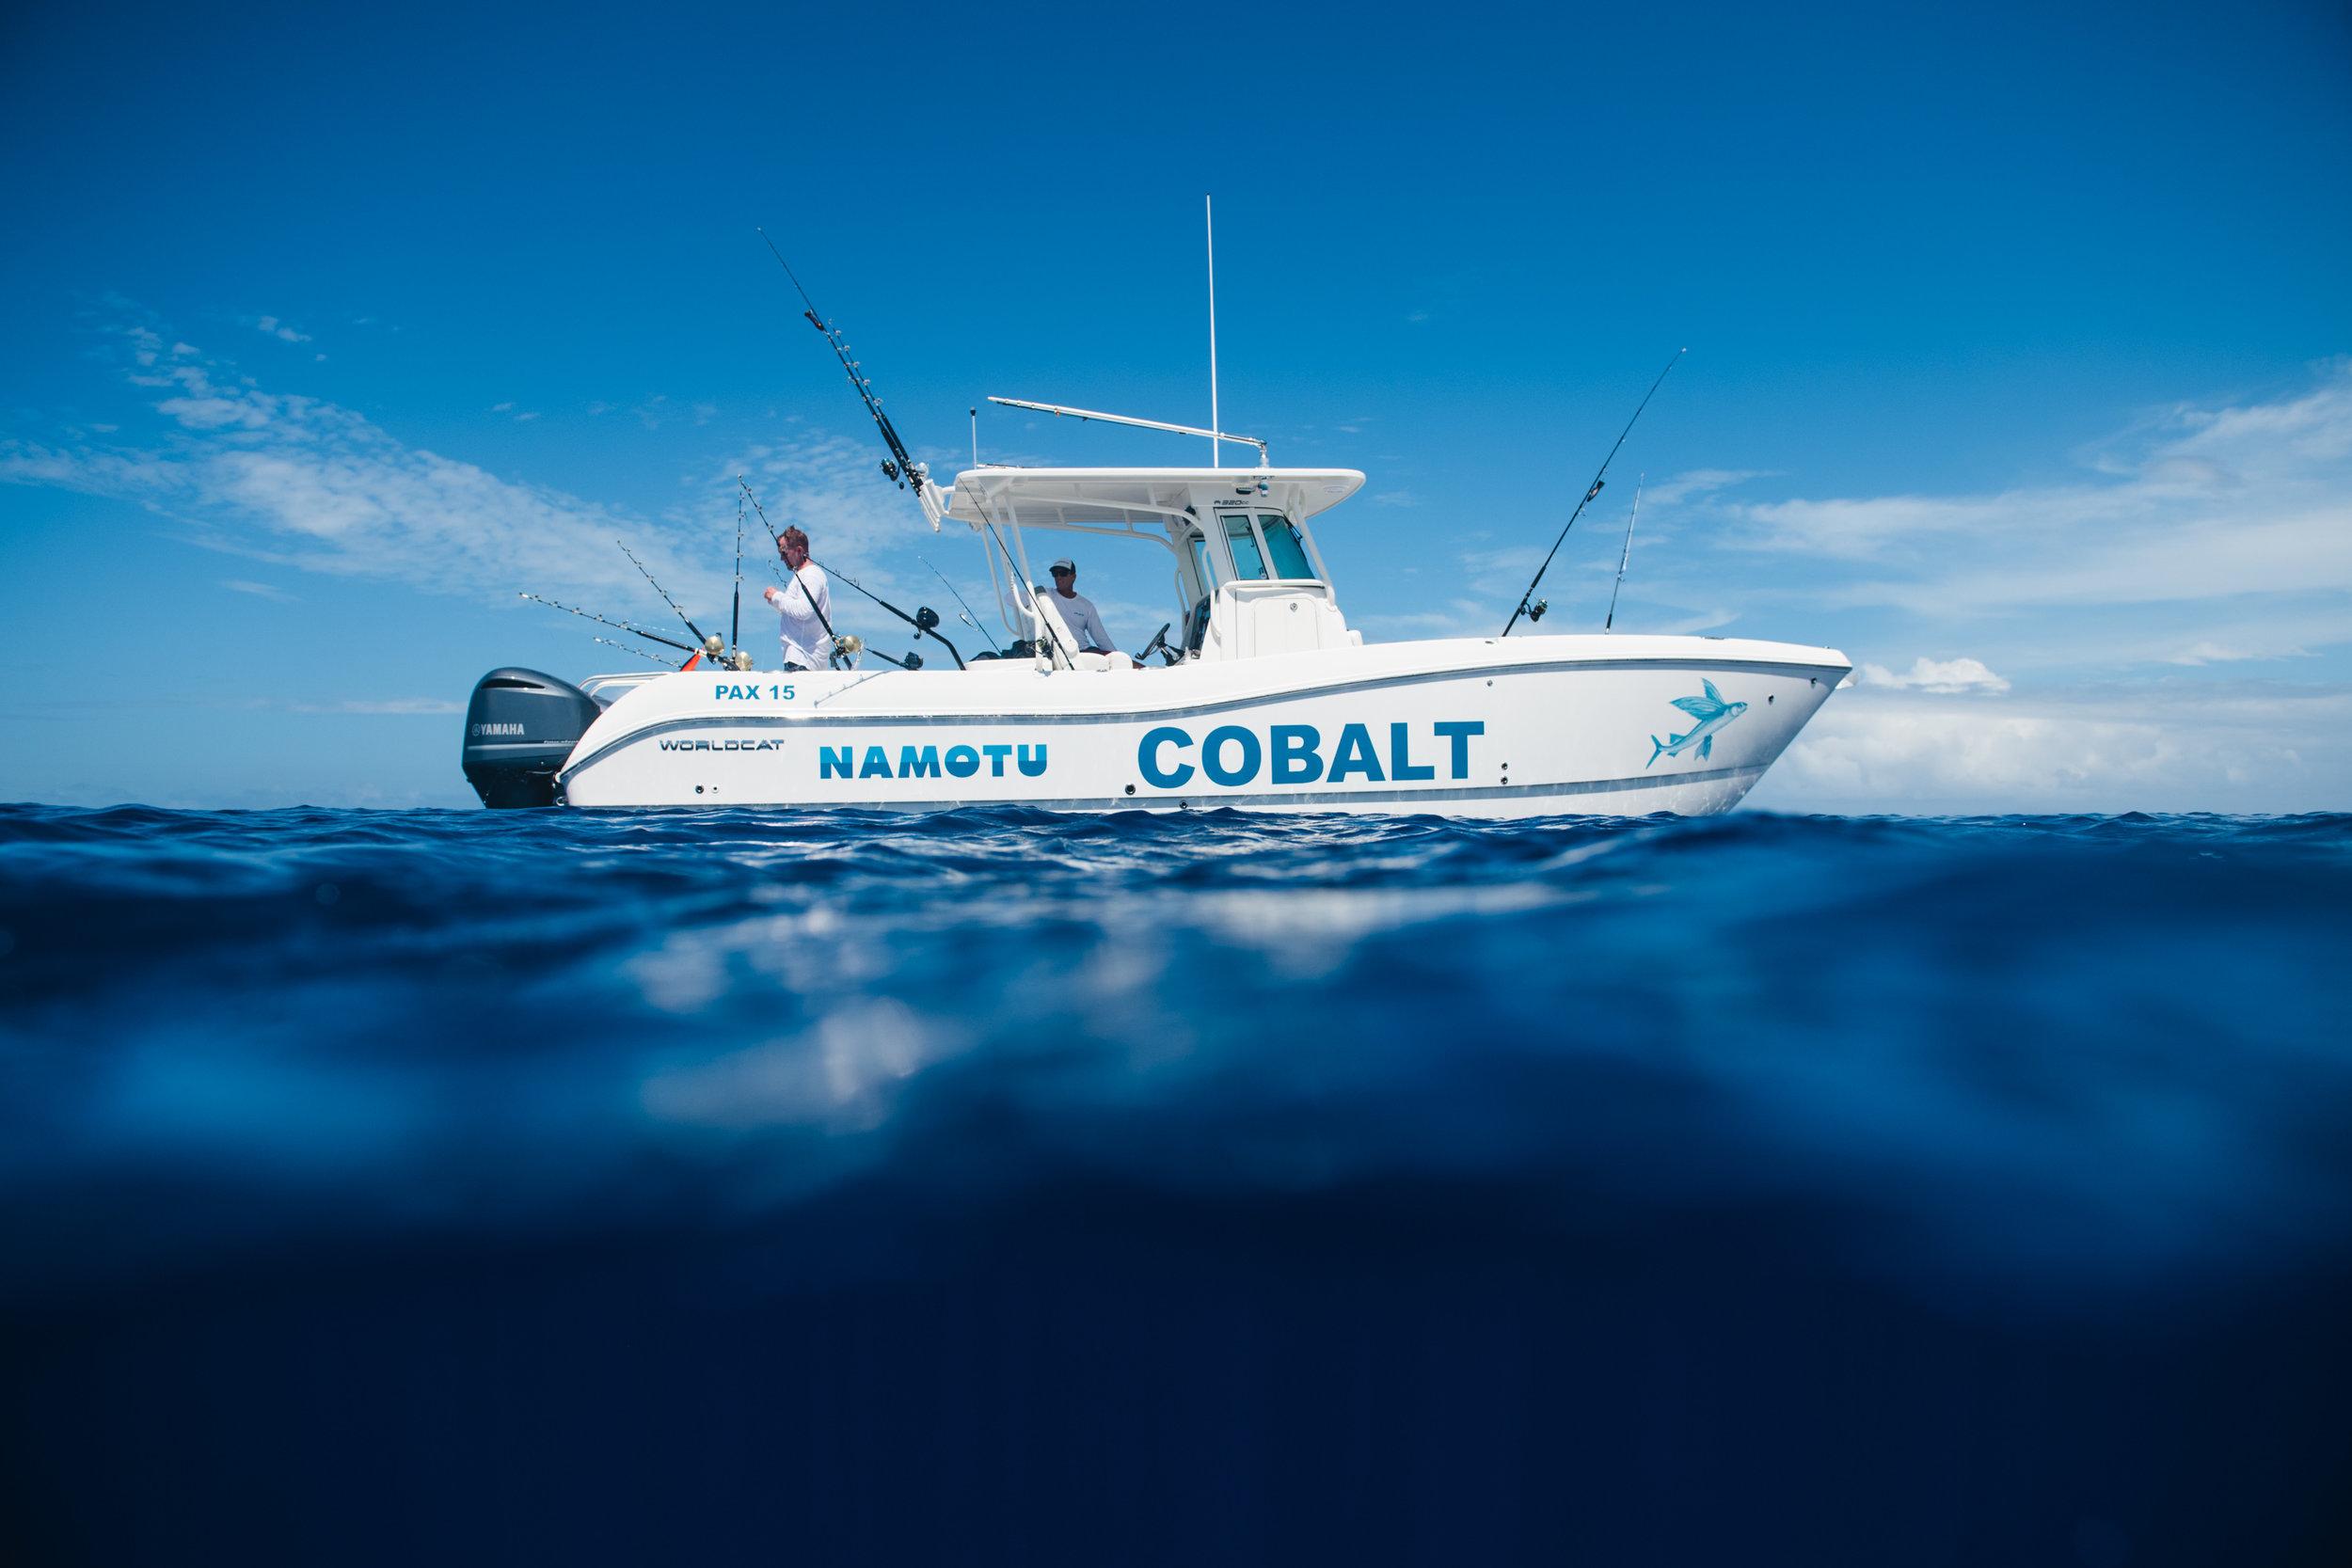 cobalt-namotu-fishing-charter-luxury